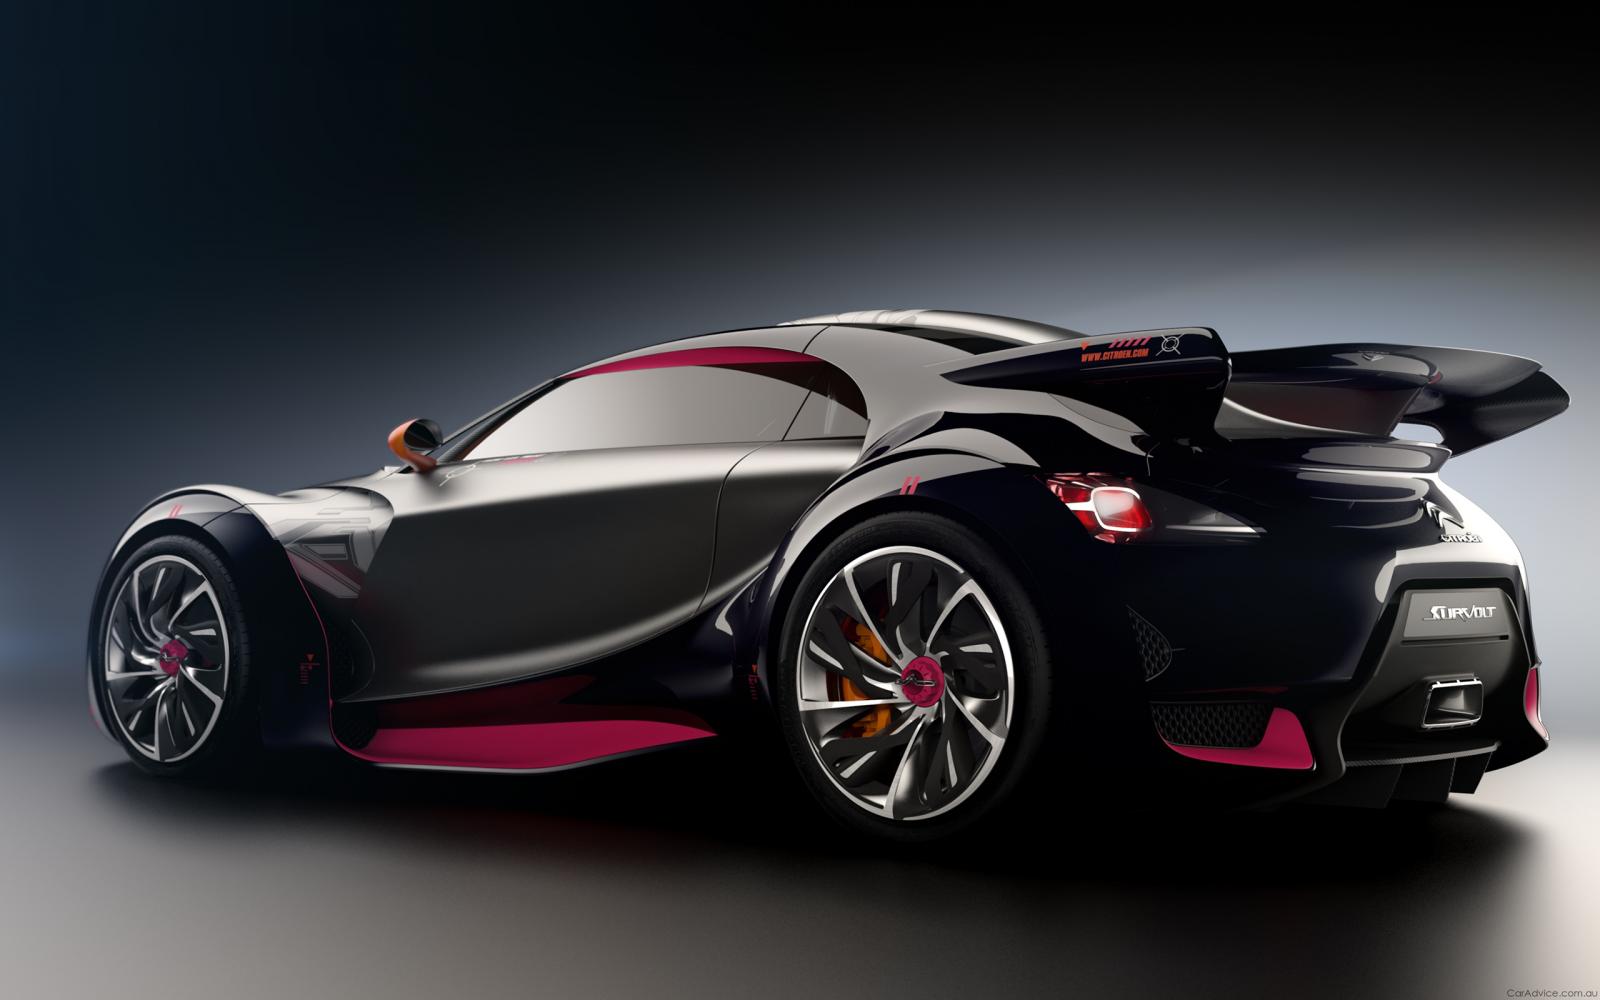 fond d 39 cran voitures de course v hicule voiture de sport citro n survolt voiture. Black Bedroom Furniture Sets. Home Design Ideas